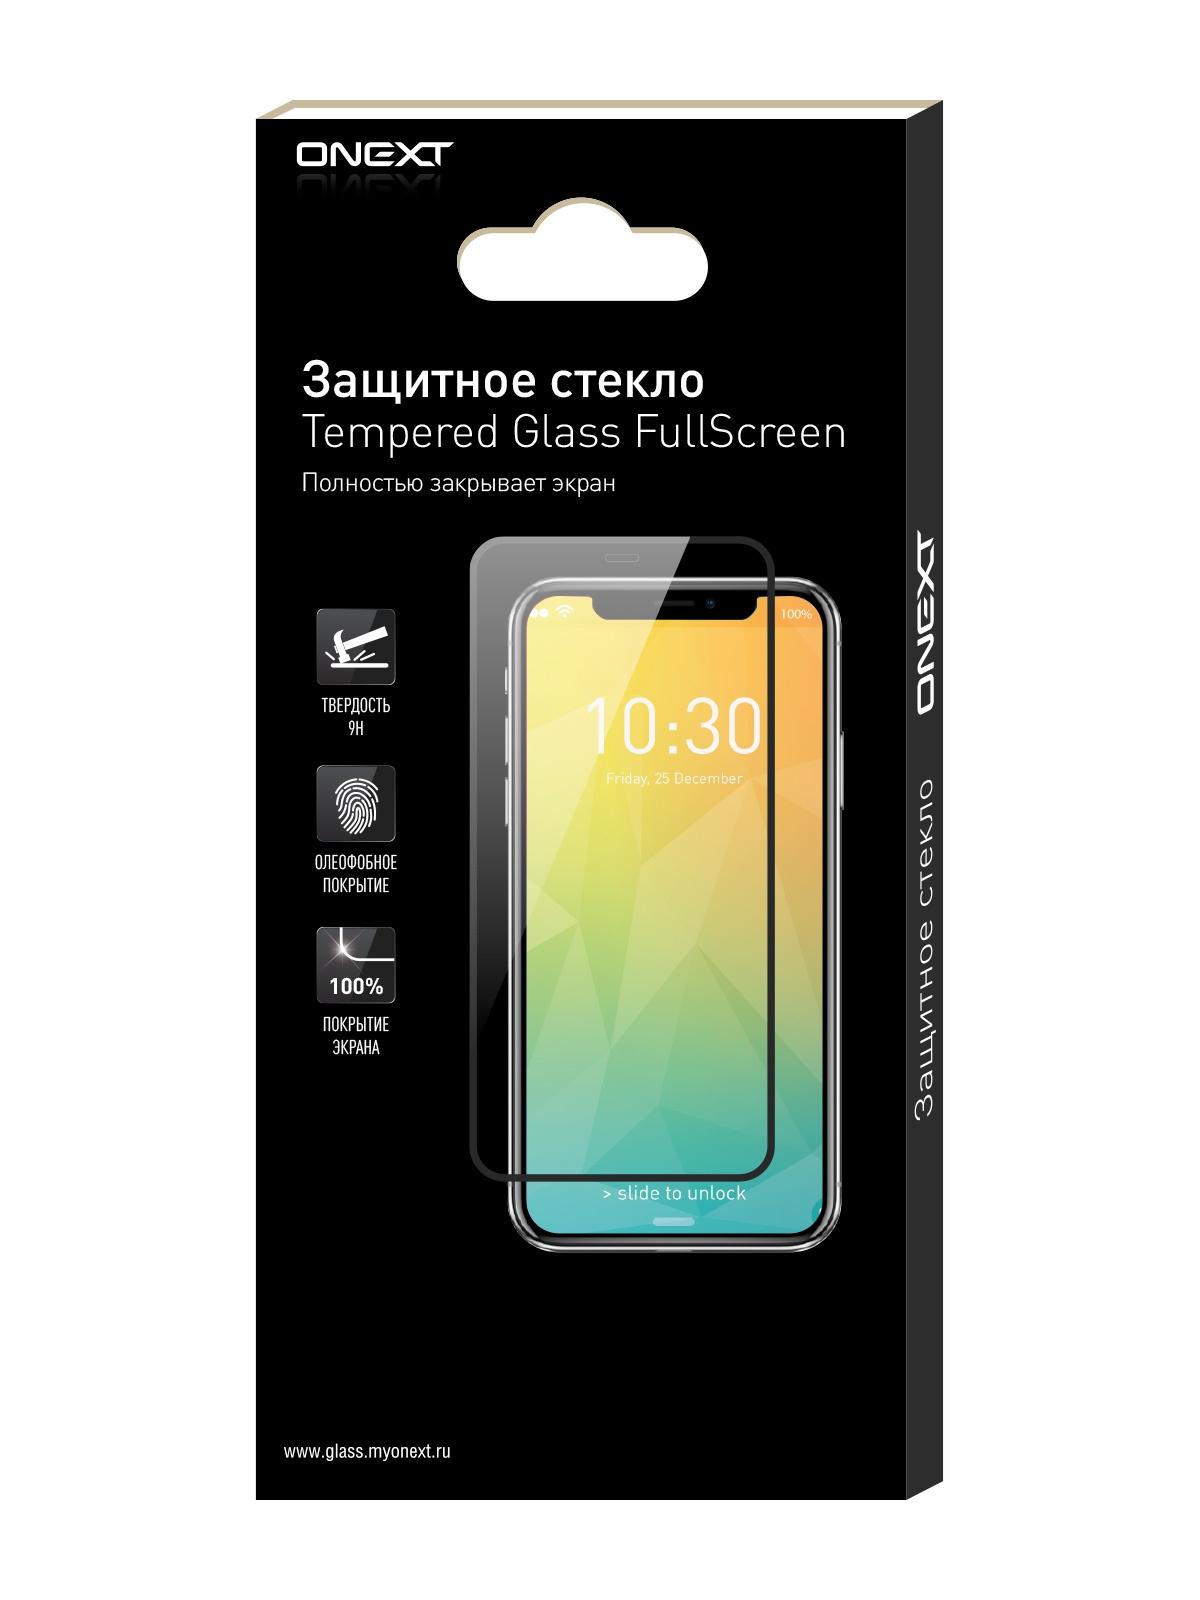 Защитное стекло ONEXT Samsung Galaxy A6,с рамкой (full glue) аксессуар защитное стекло для samsung galaxy a6 onext full glue gold 41684